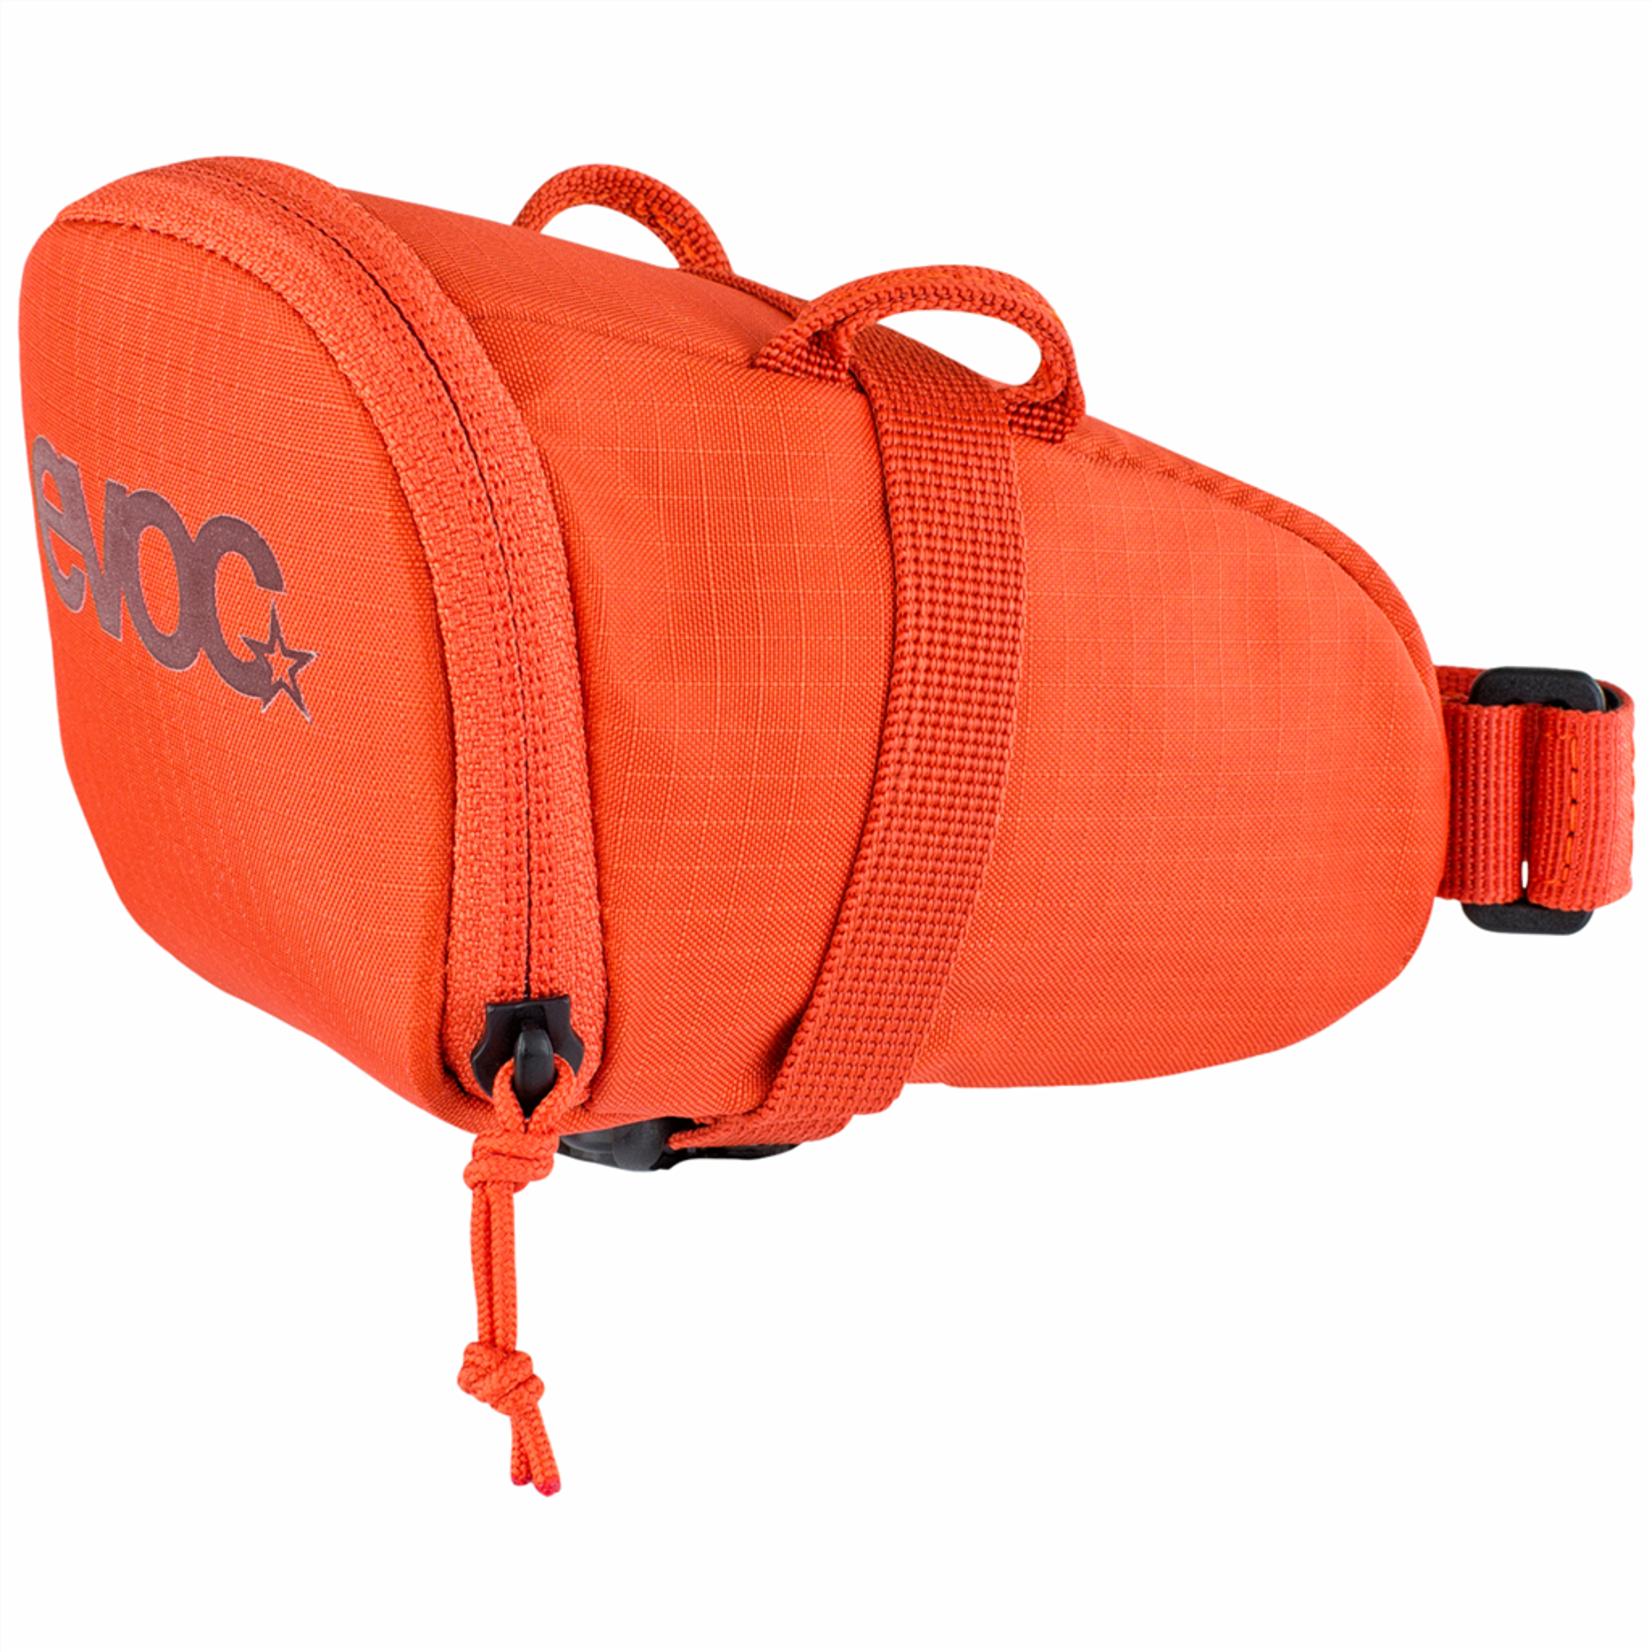 EVOC EVOC Tasche Unter Sattel 0.7L - orange